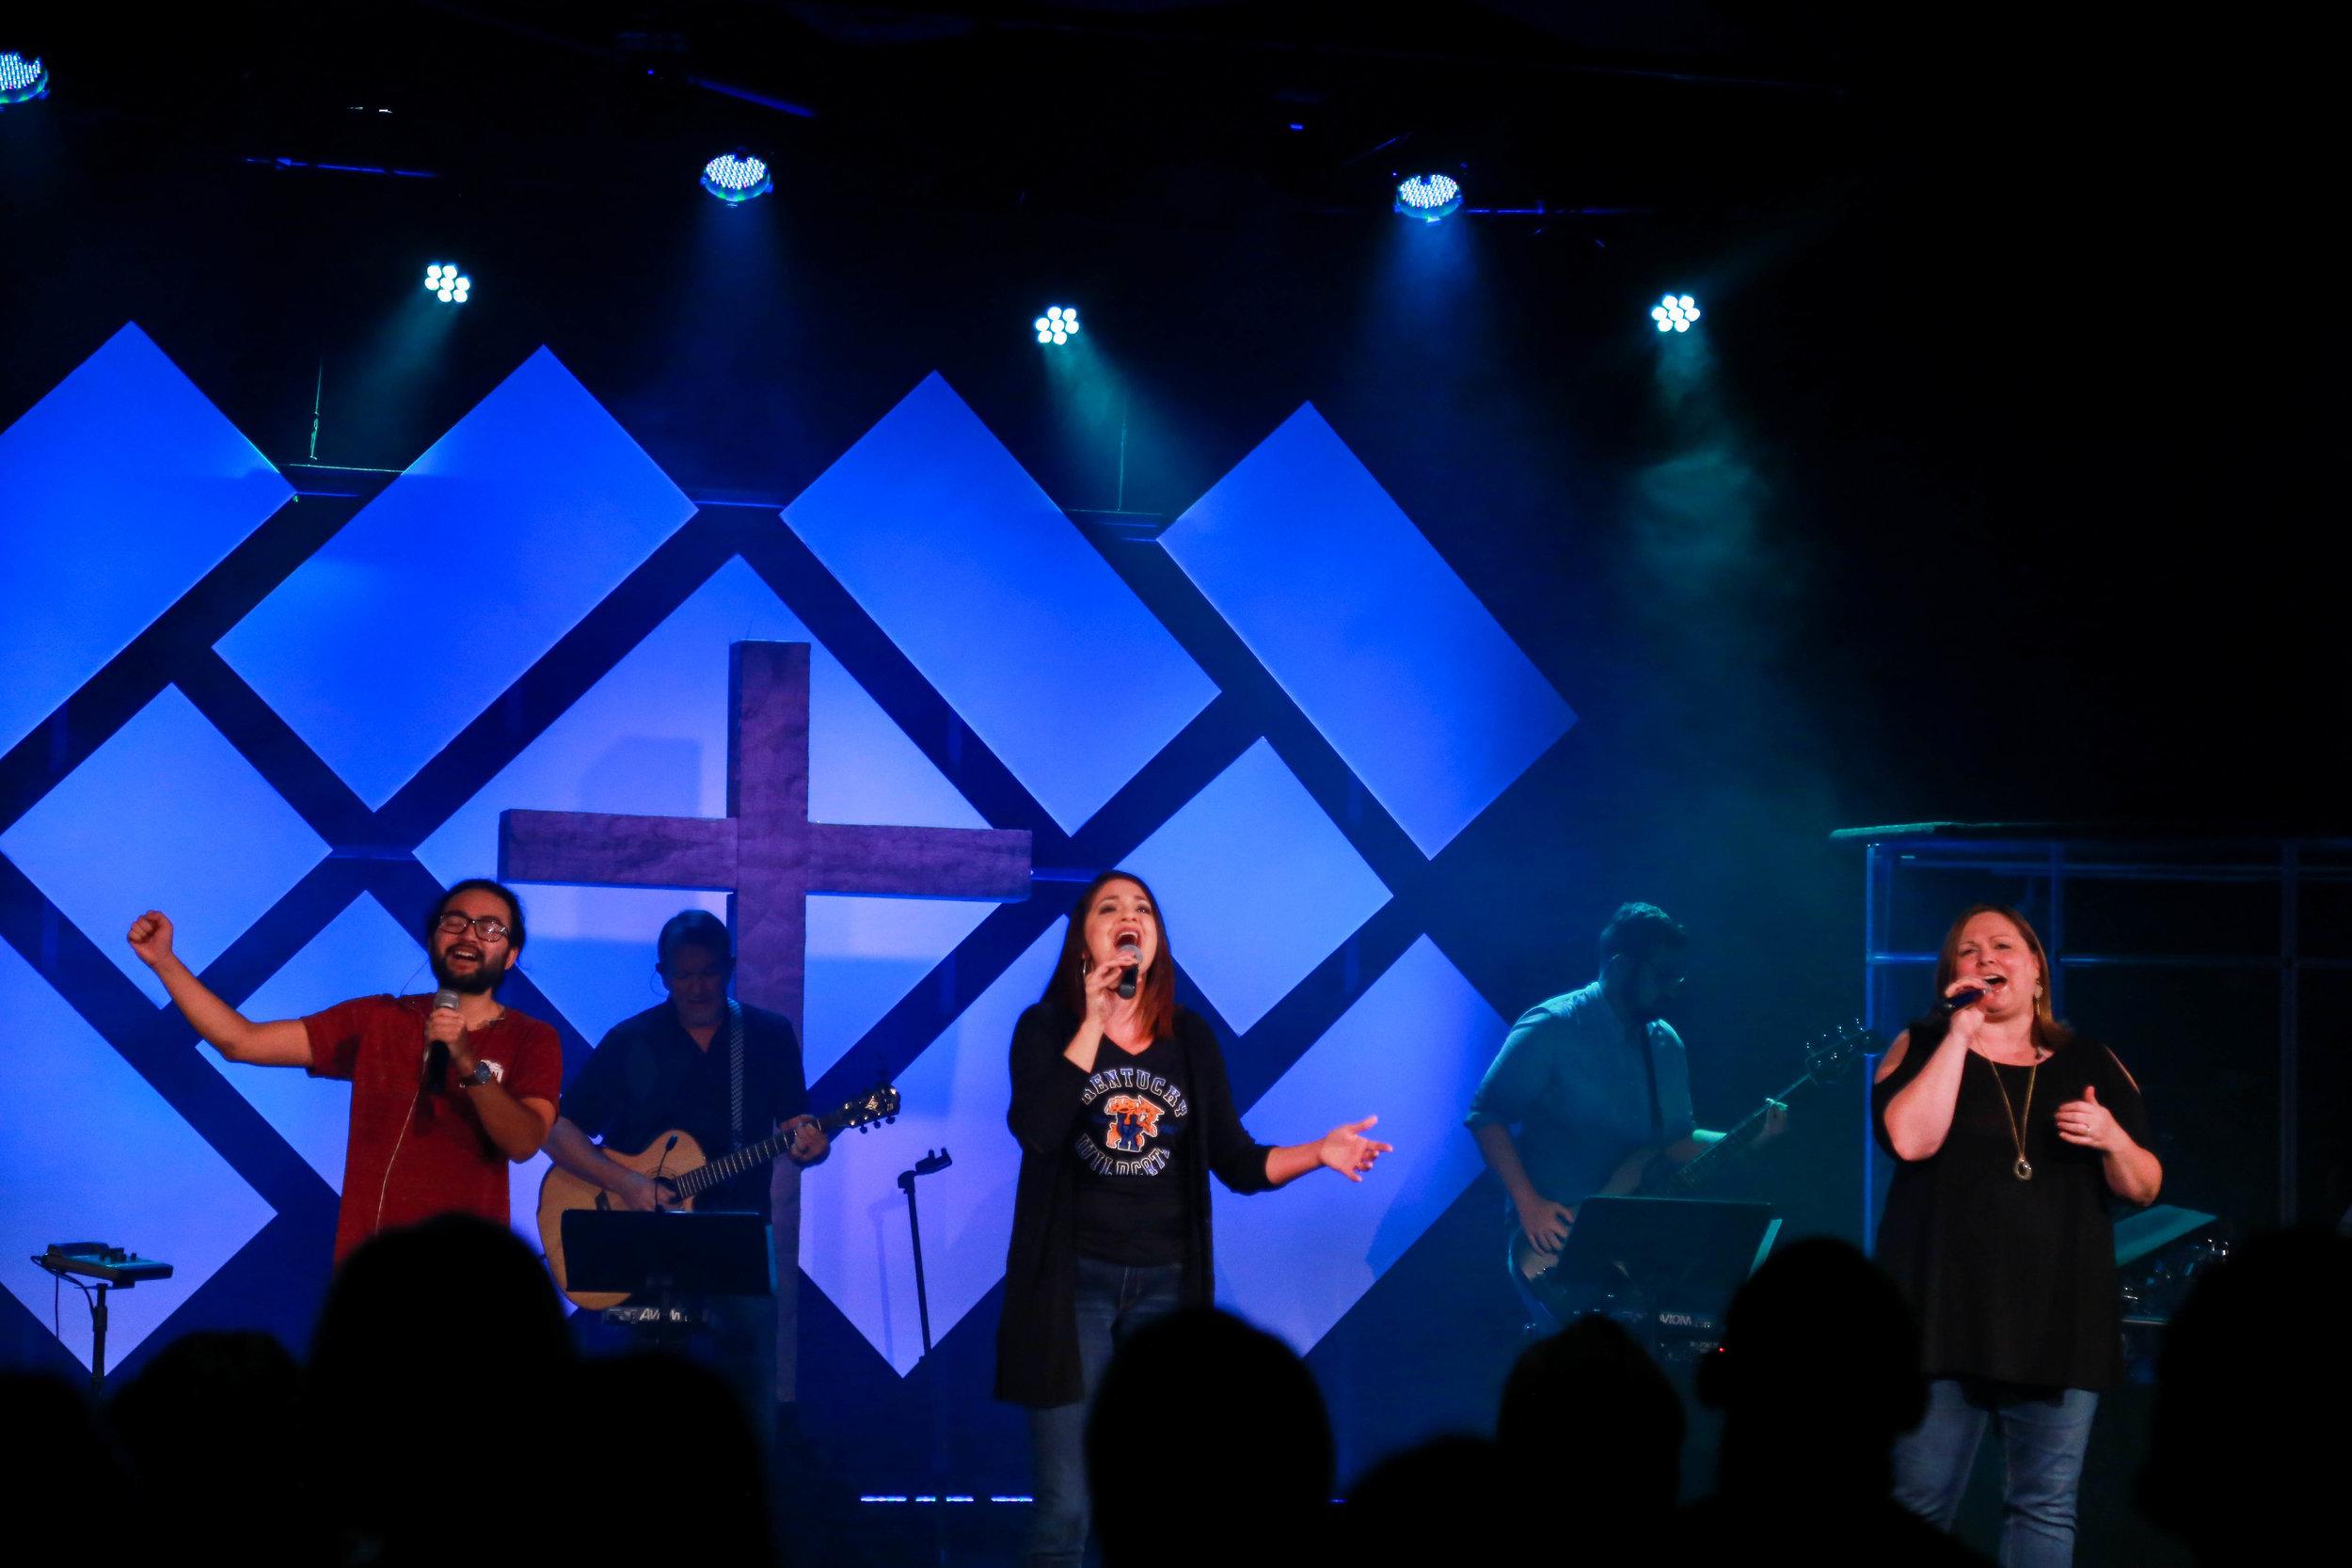 Three vocalists sing on stage at Vineyard Richmond